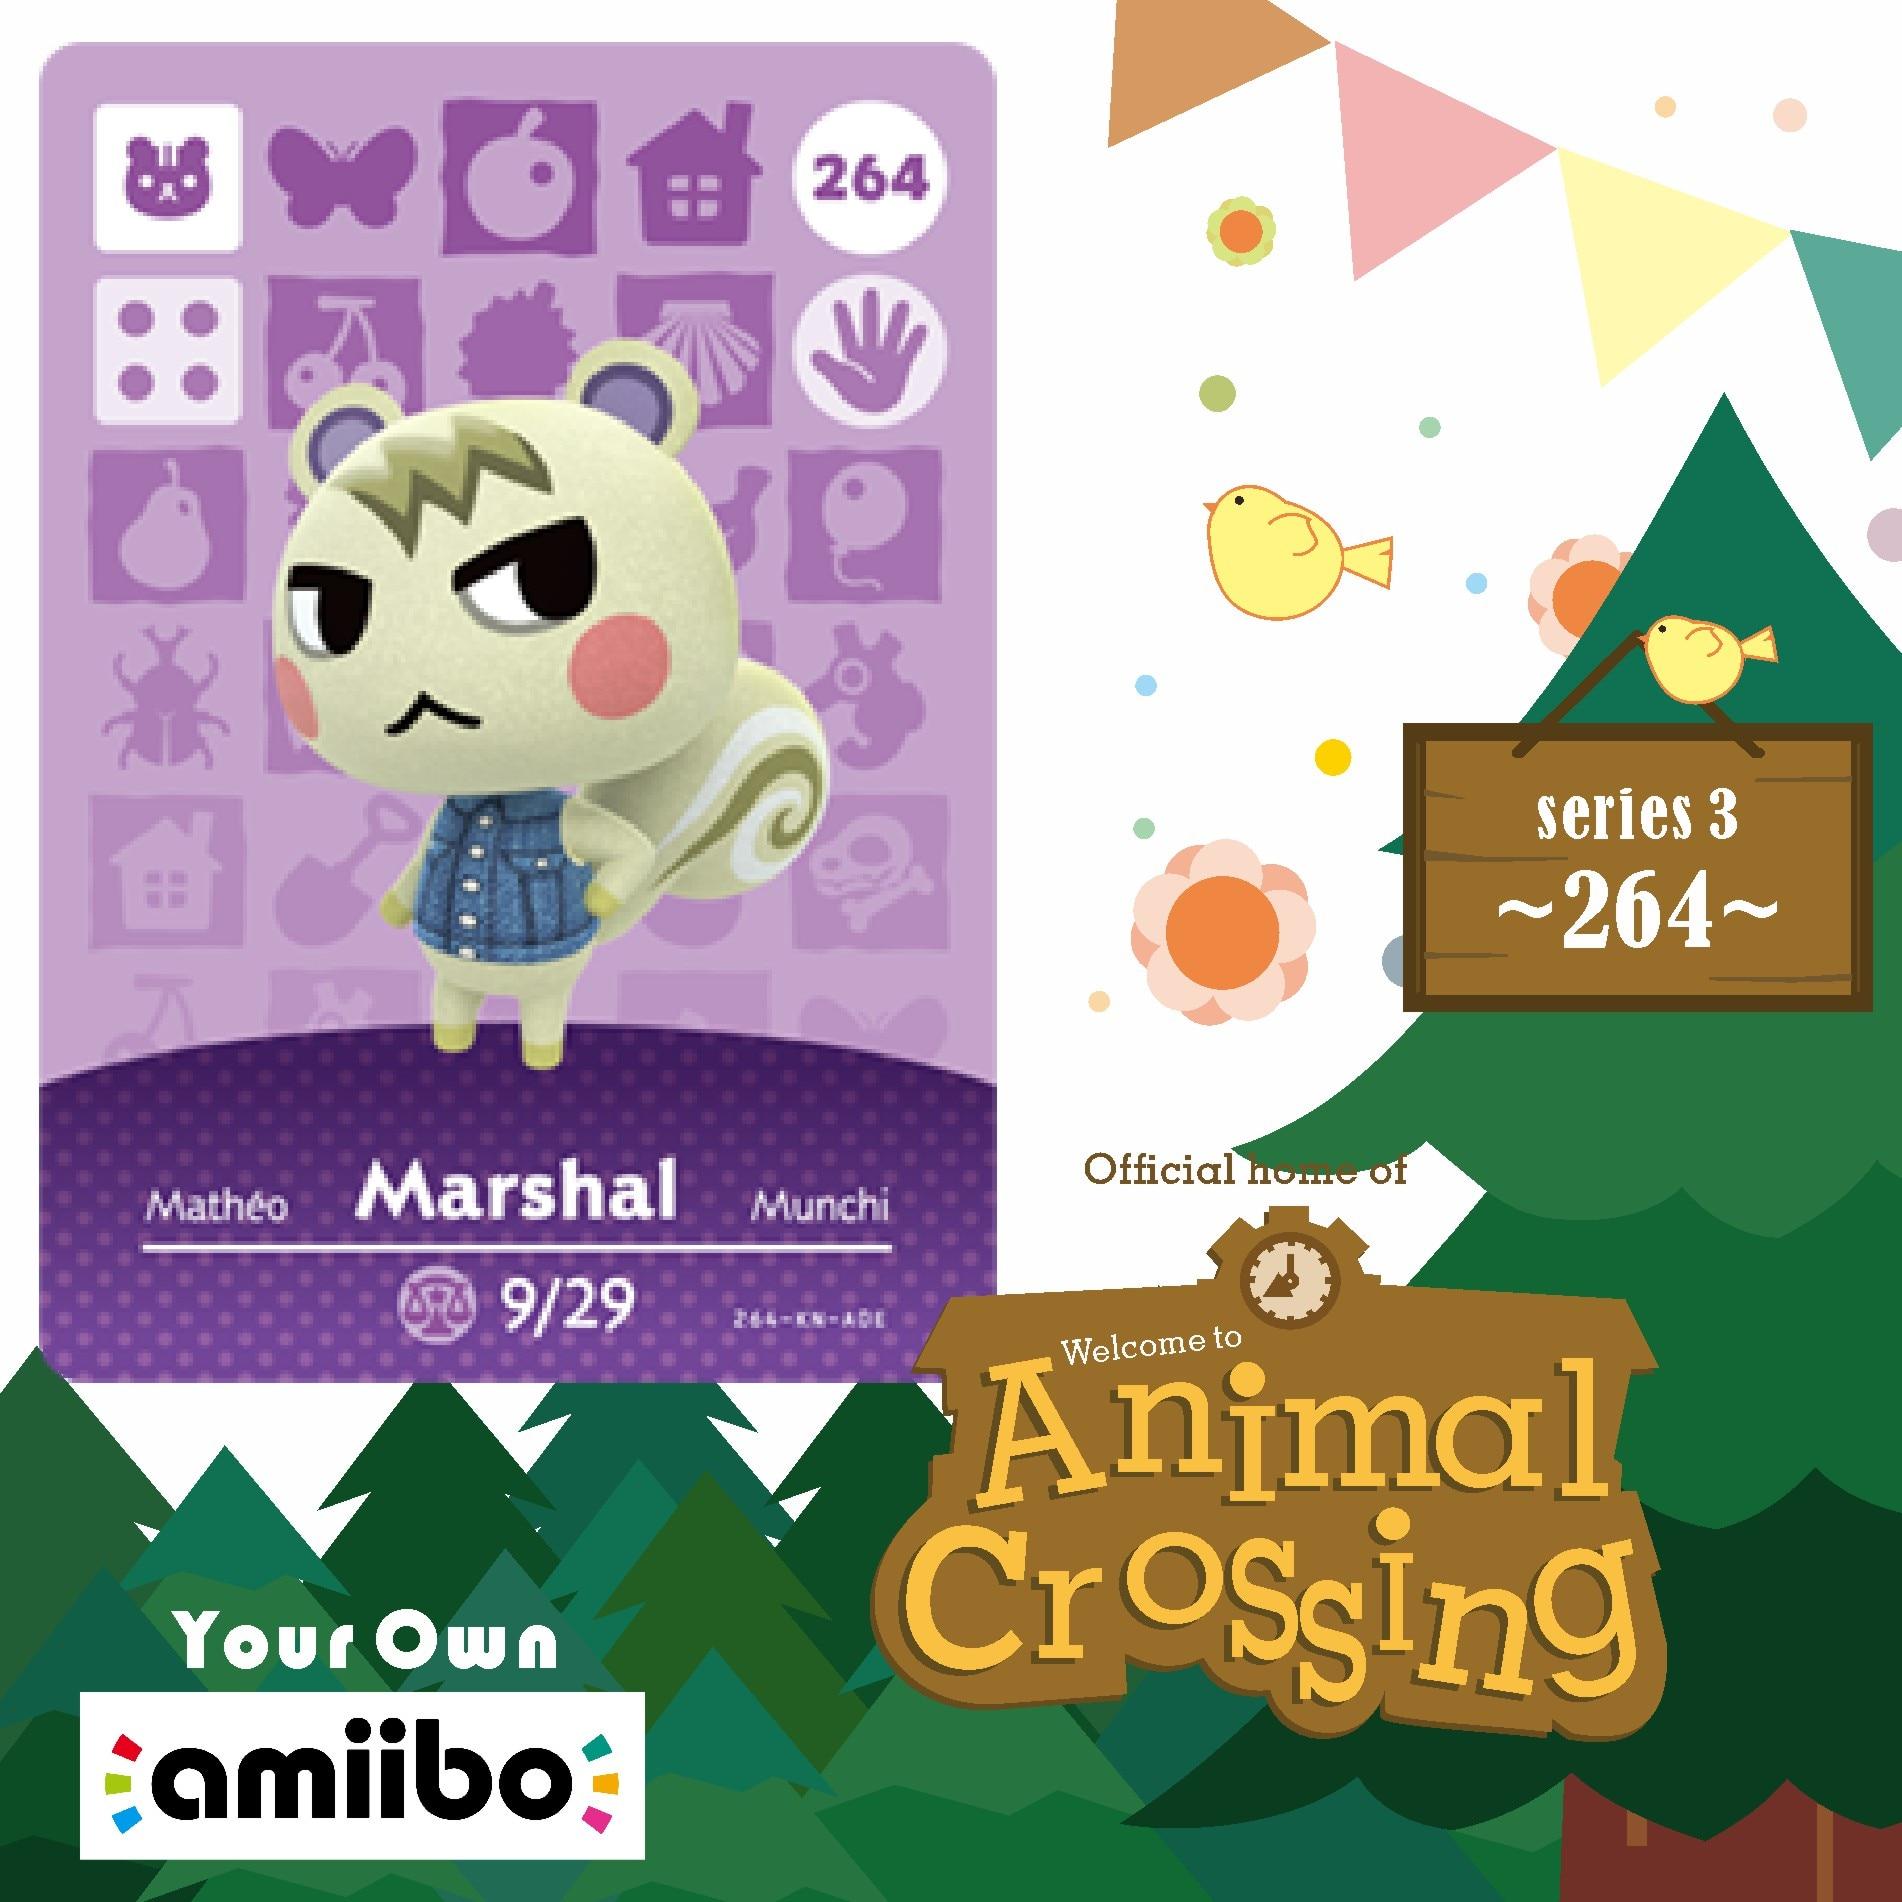 Welcome Amiibo Card Card Marshal Animal Crossing Marshal Animal Crossing Marshal Animal Crossing Marshal Animal Crossing Marshal 1